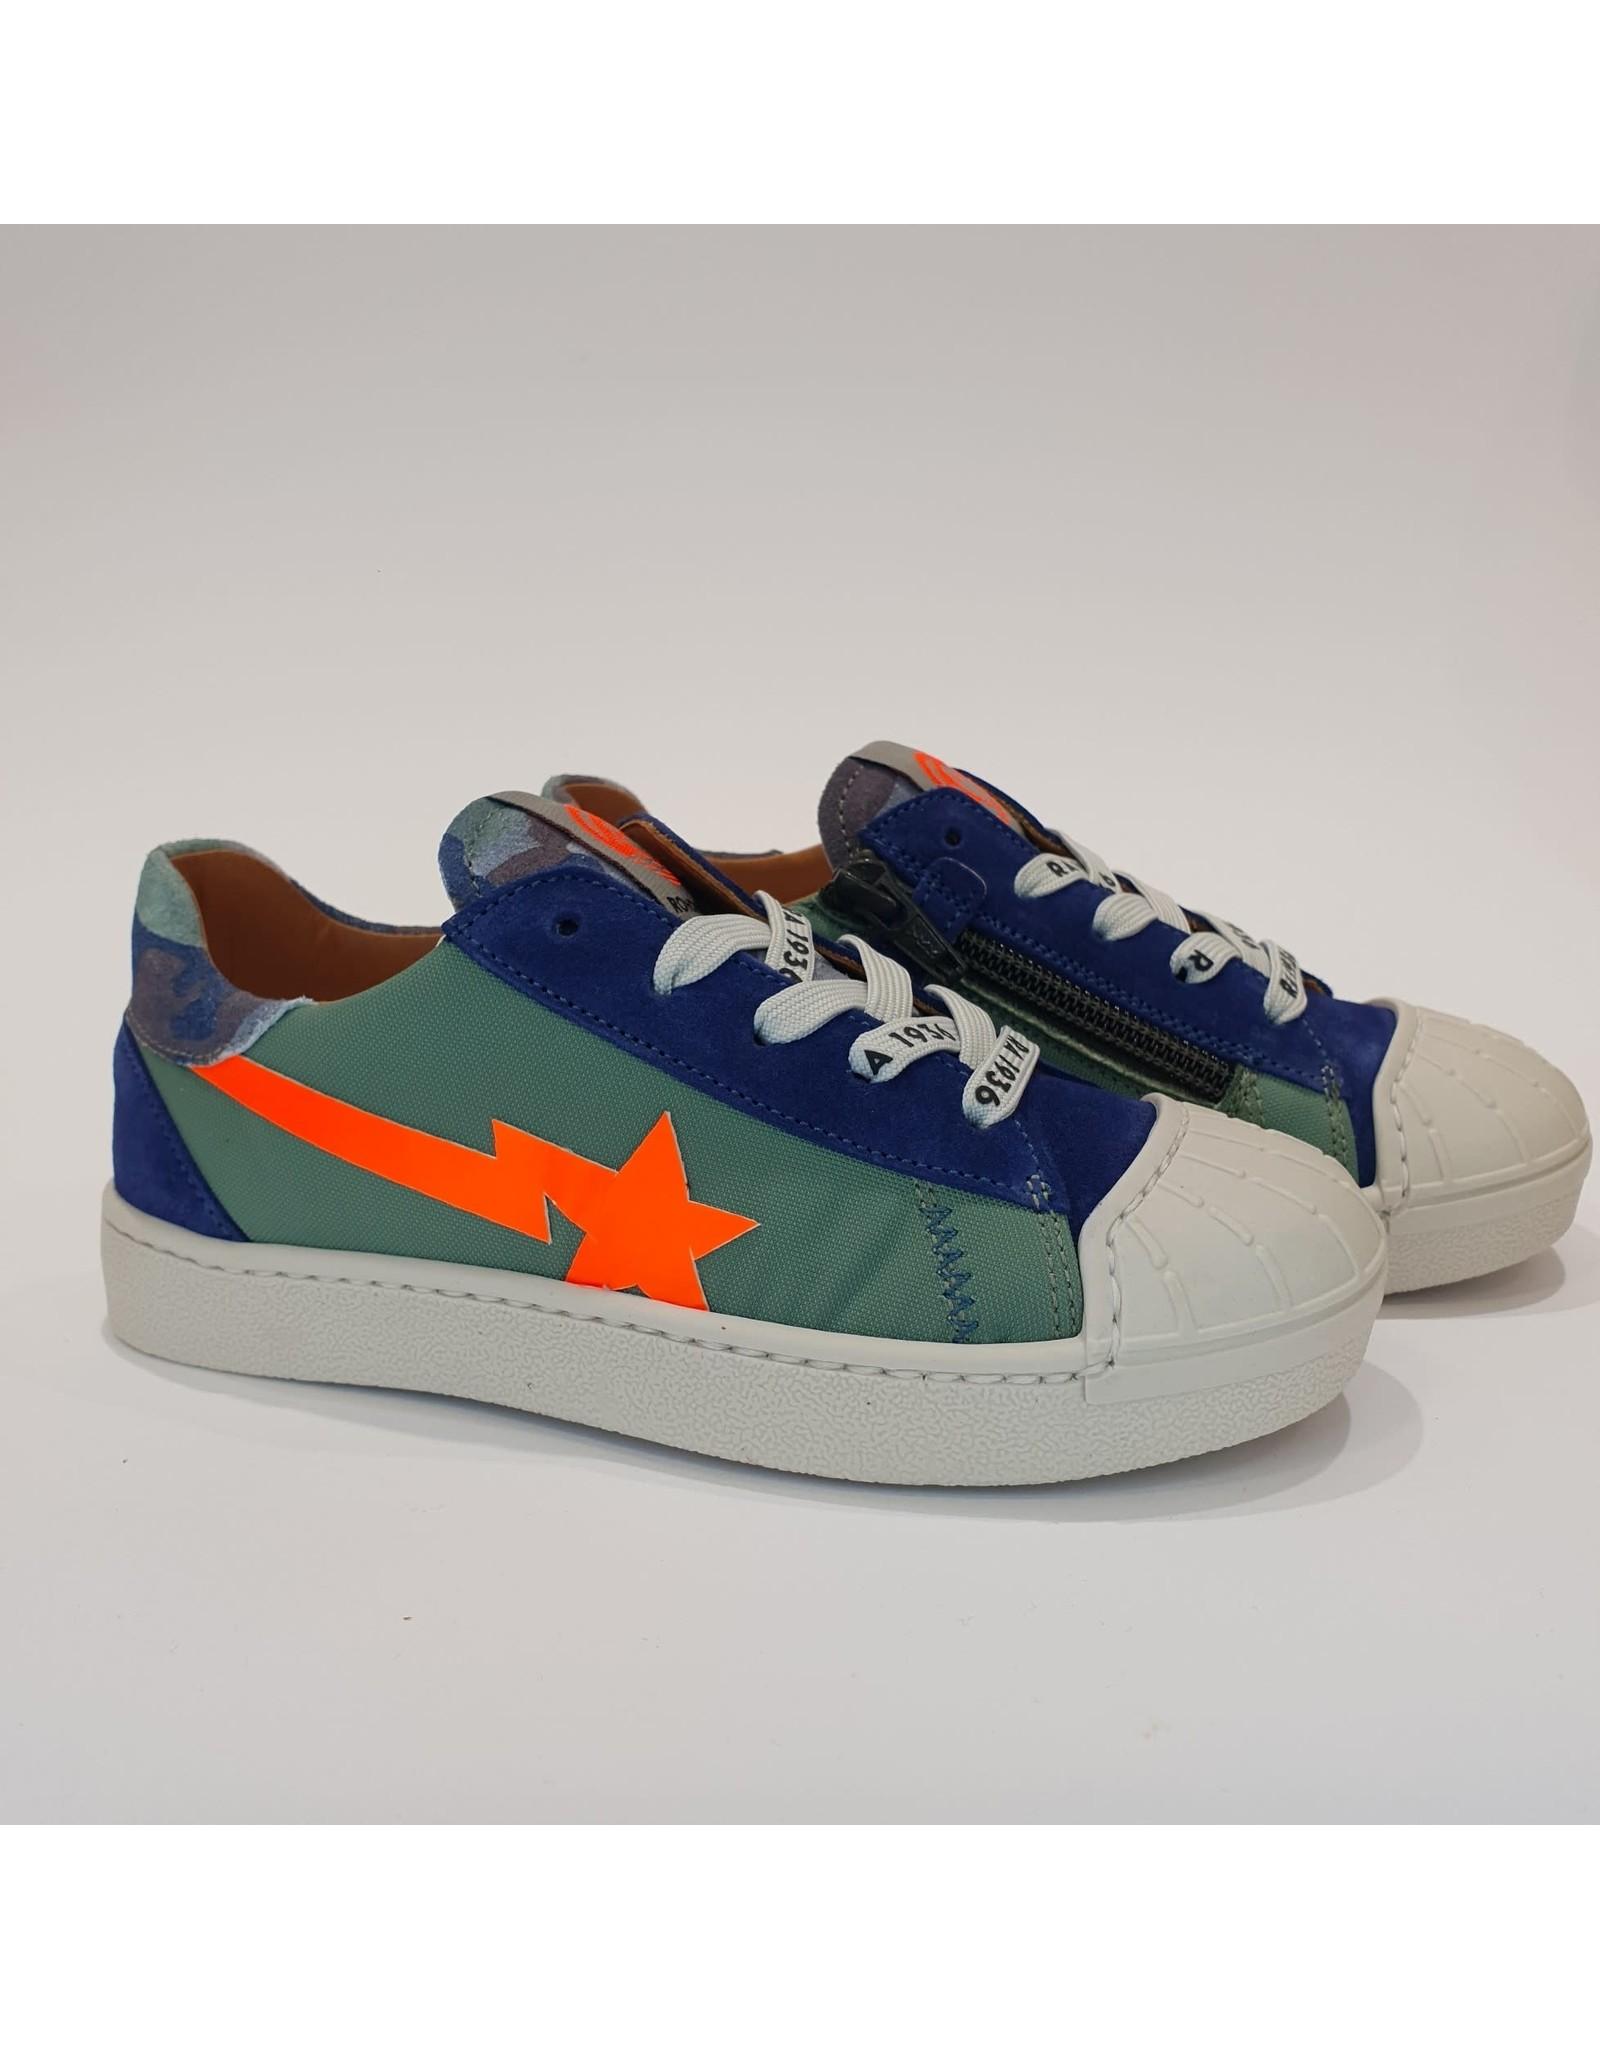 Rondinella sneaker groen/blauw oranje ster